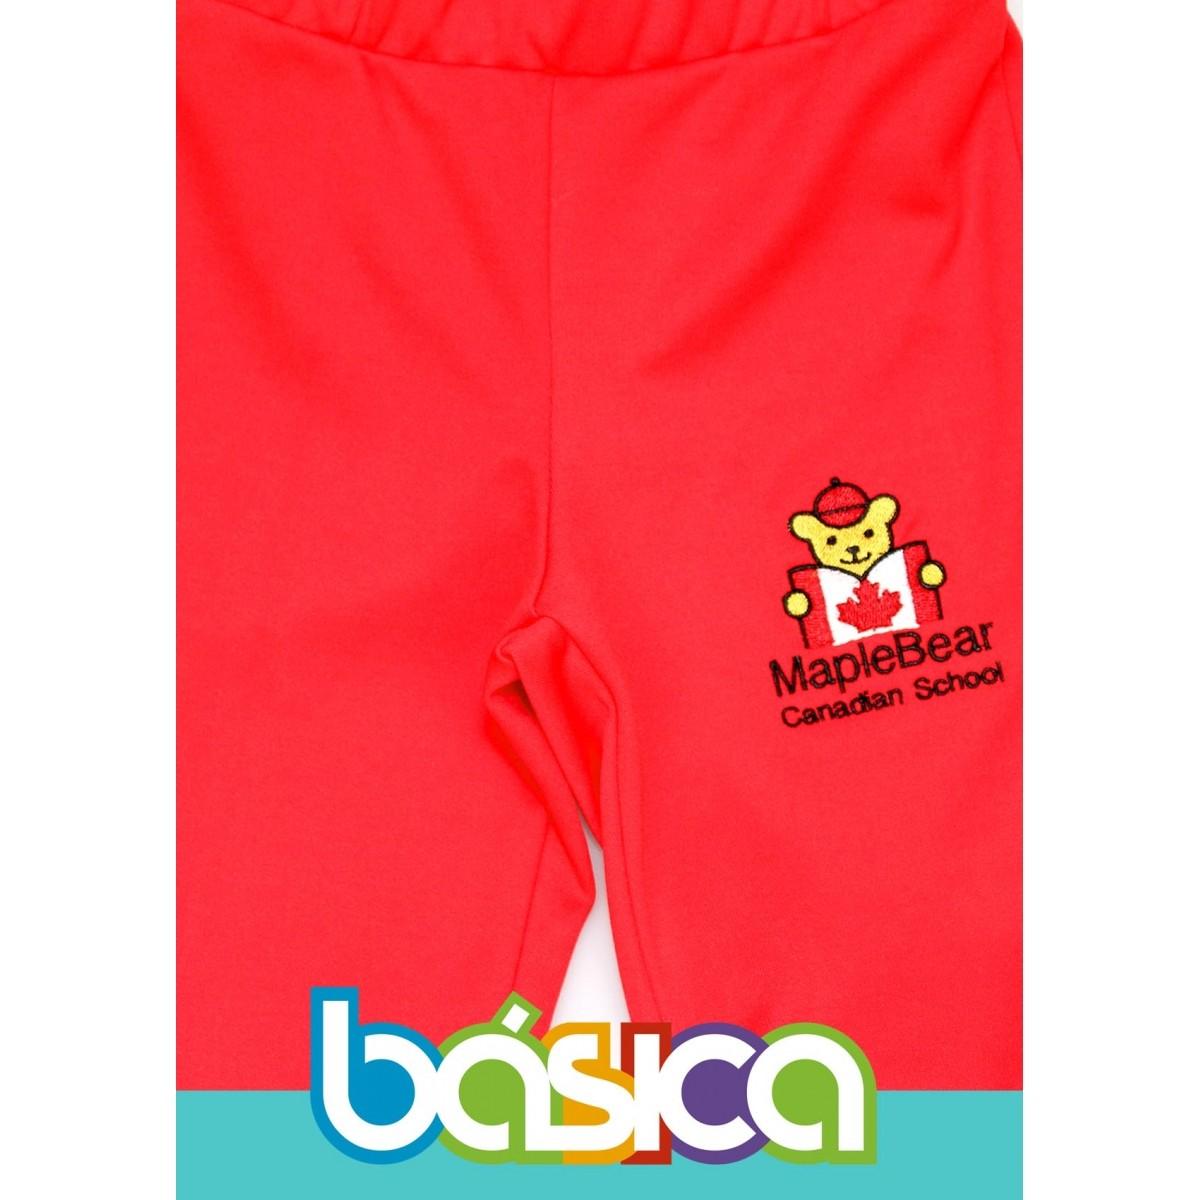 Calça Bailarina Helanca Maple Bear Infantil  - BÁSICA UNIFORMES